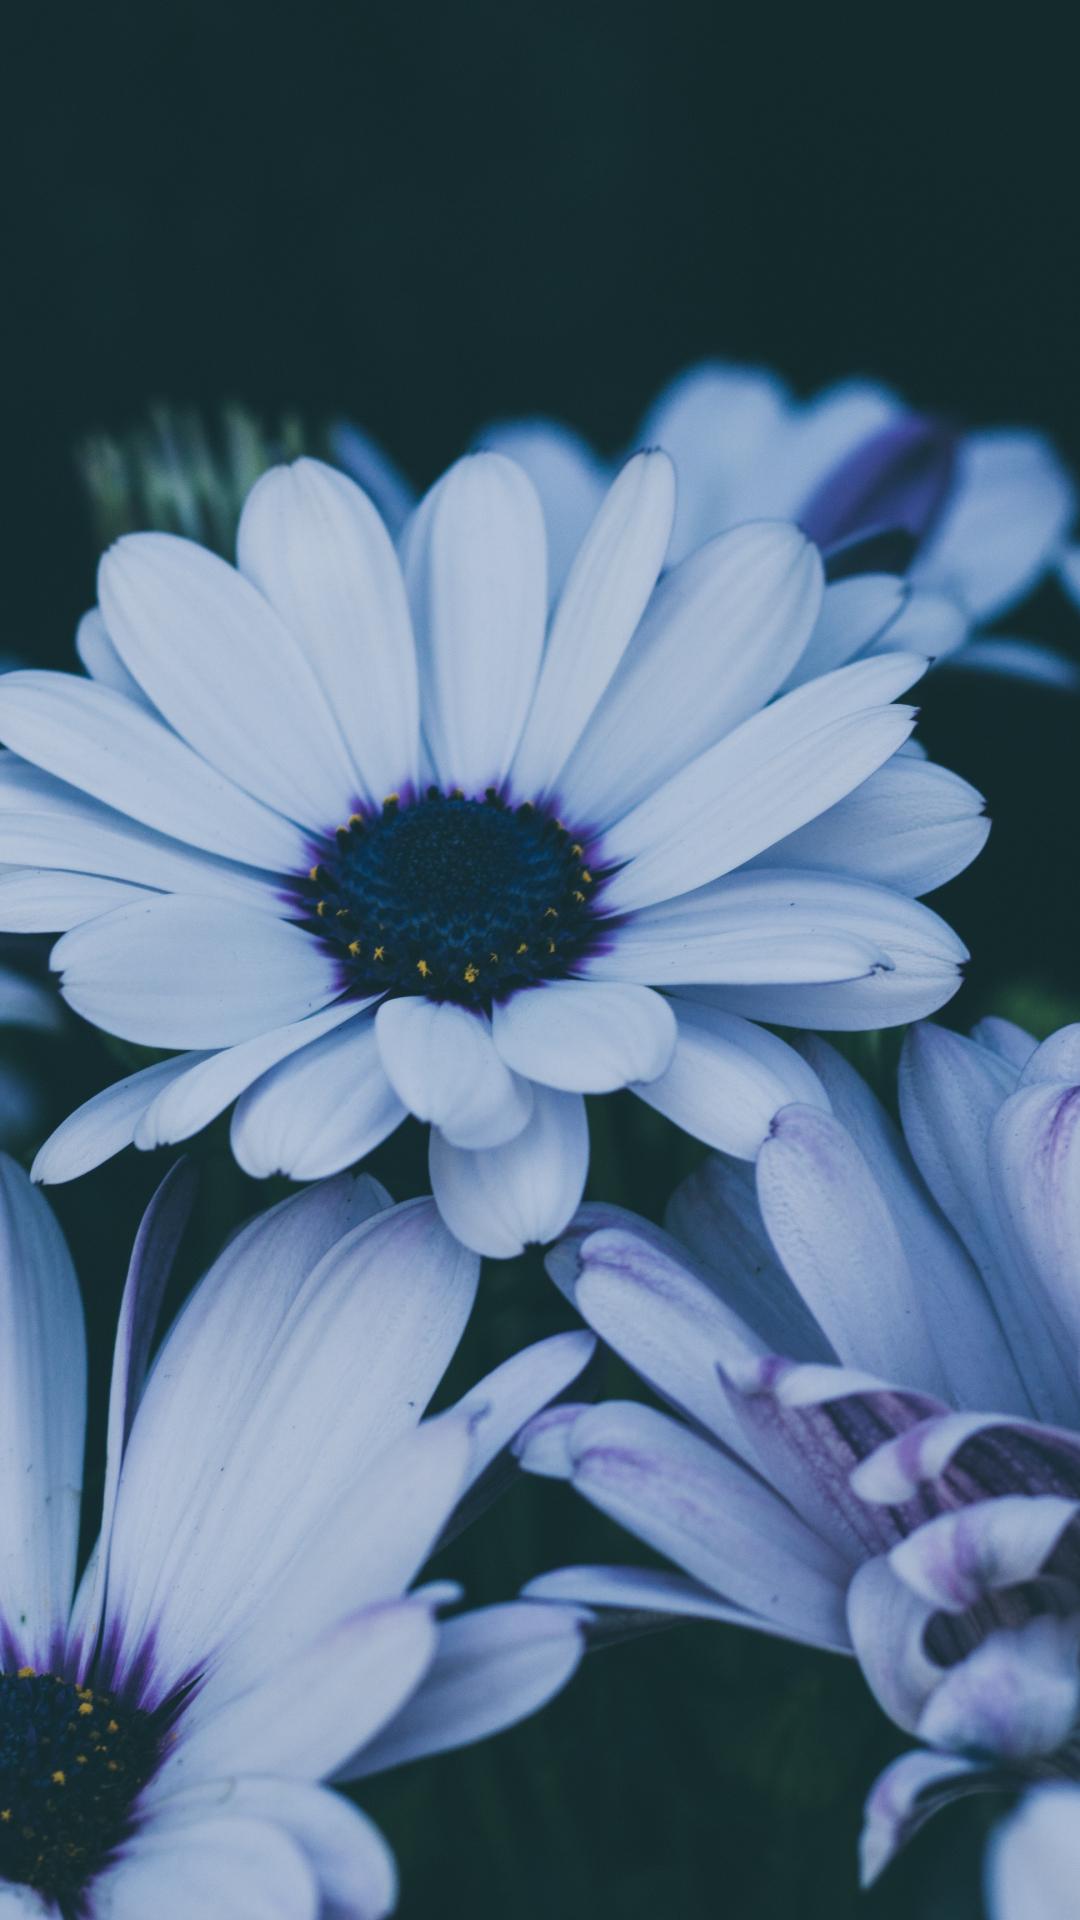 Flower, Blossom iPhone Wallpaper